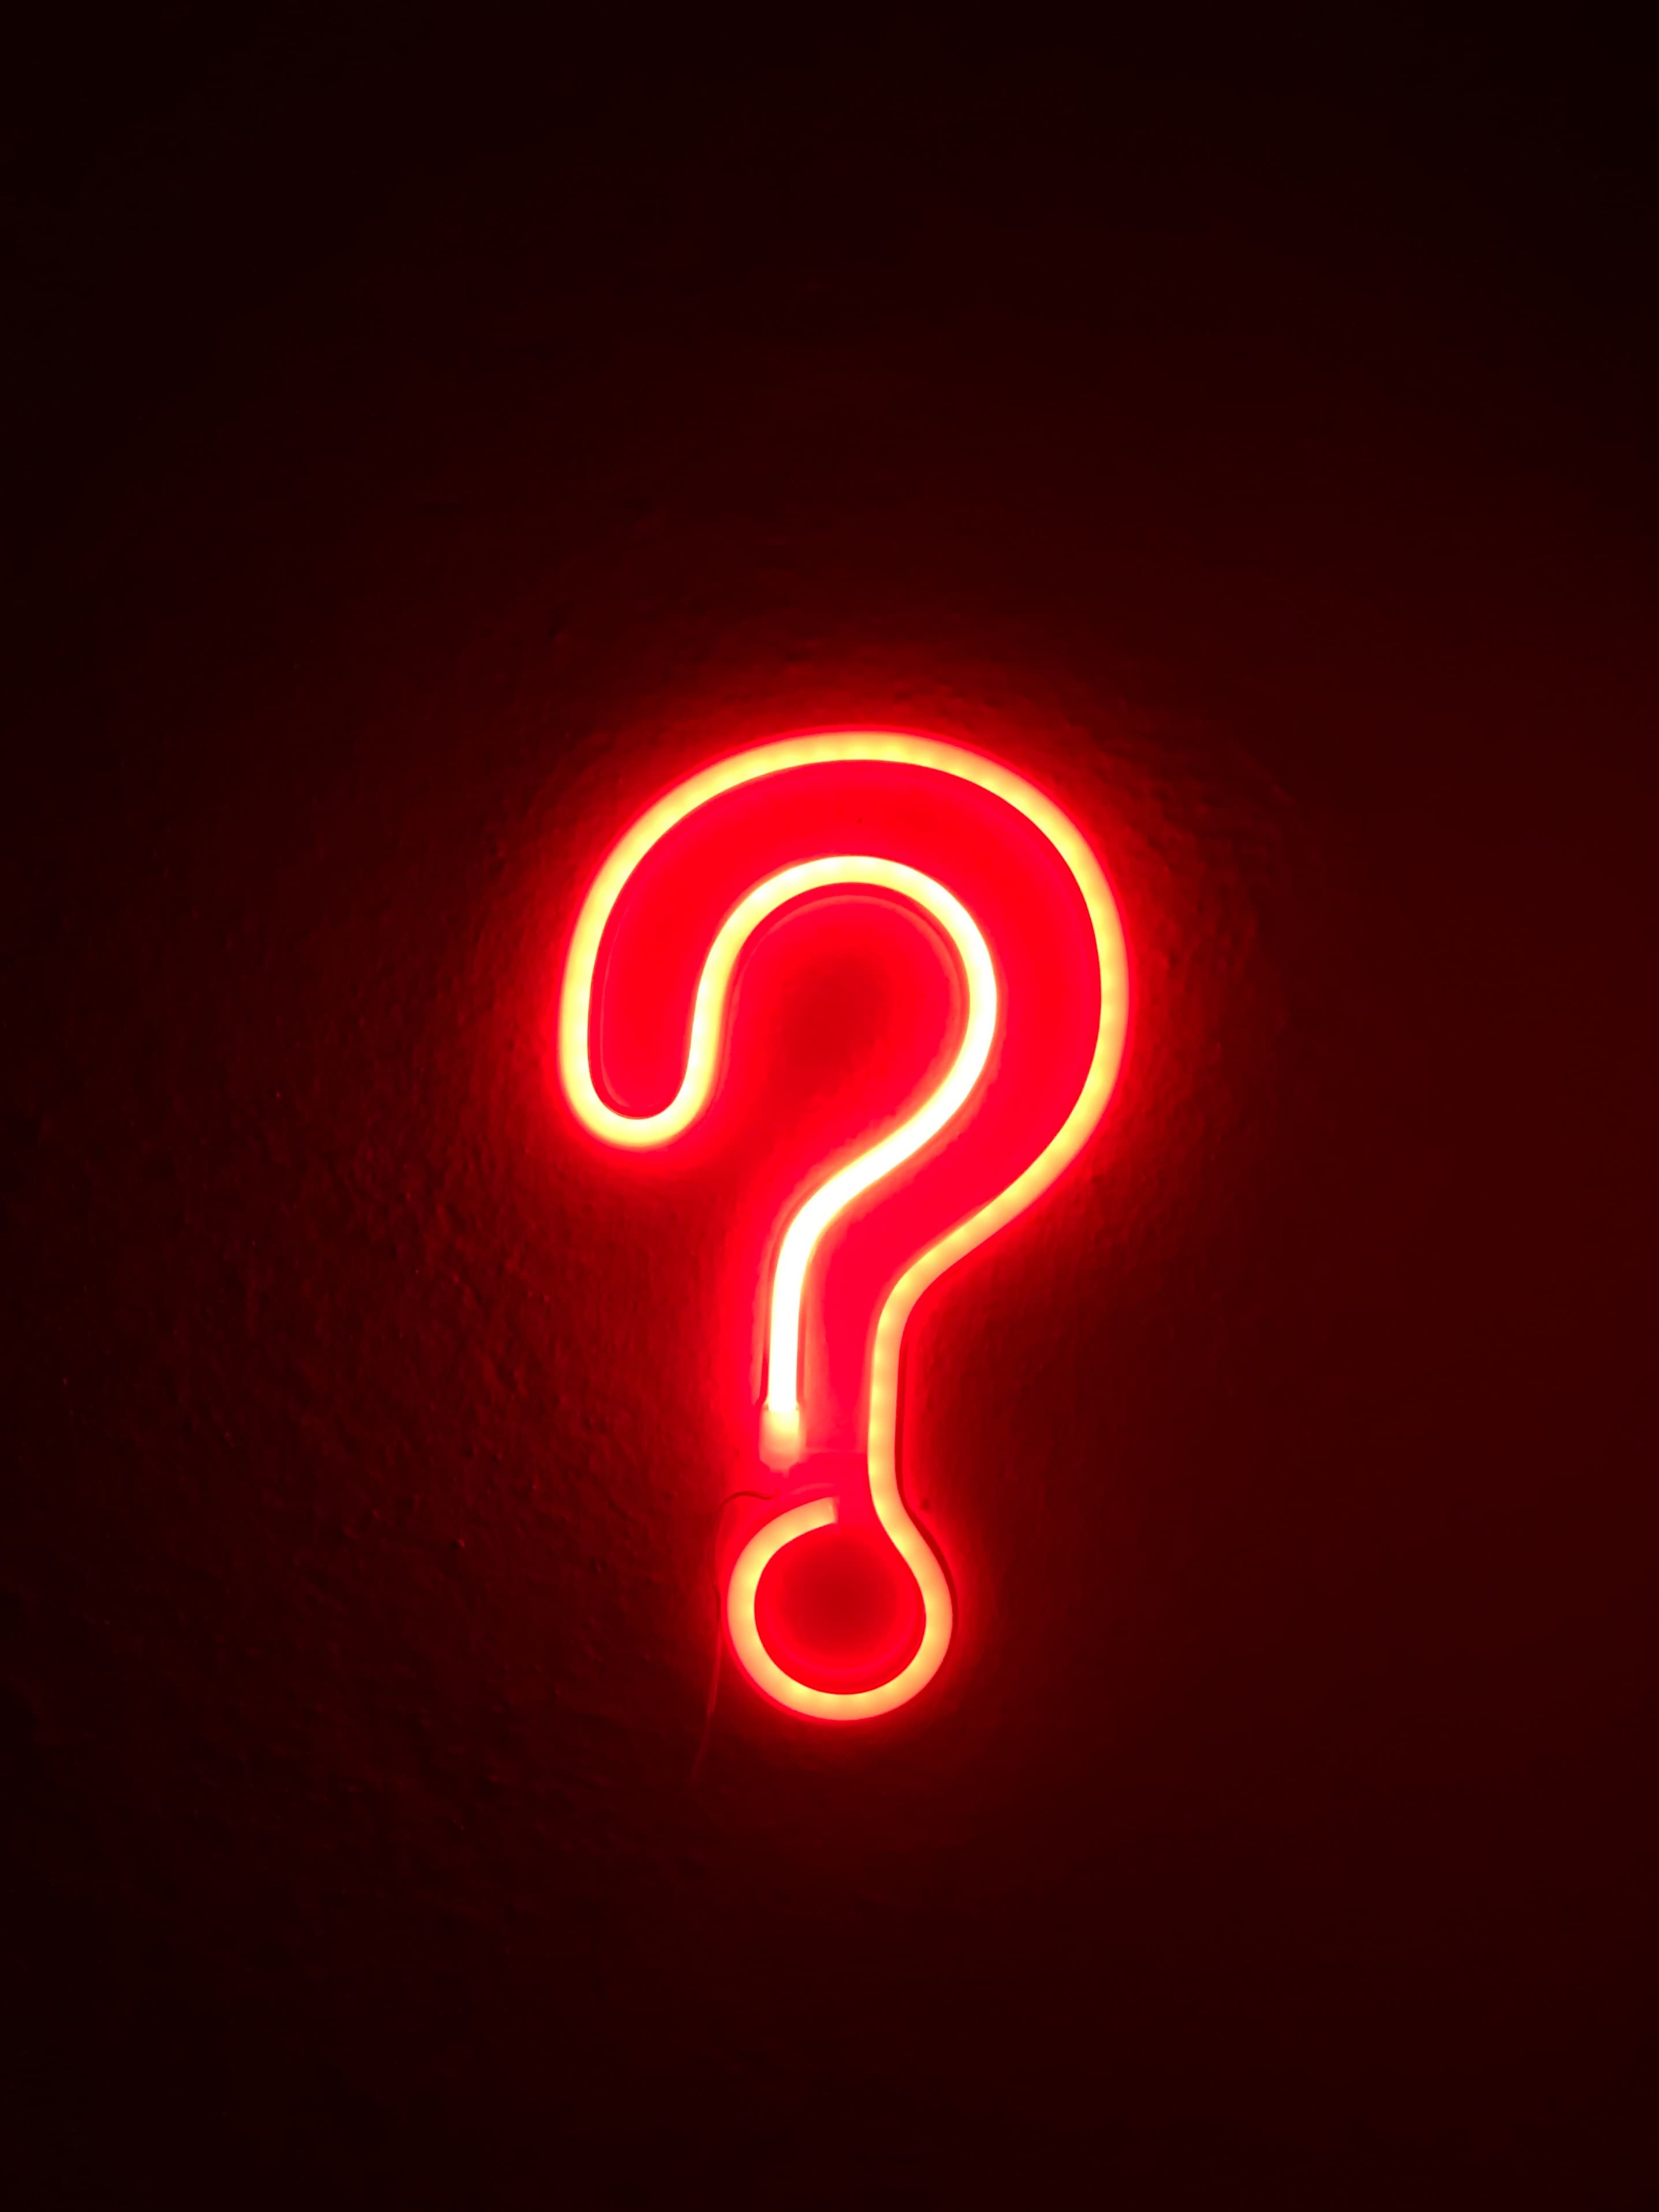 orange question mark in lights